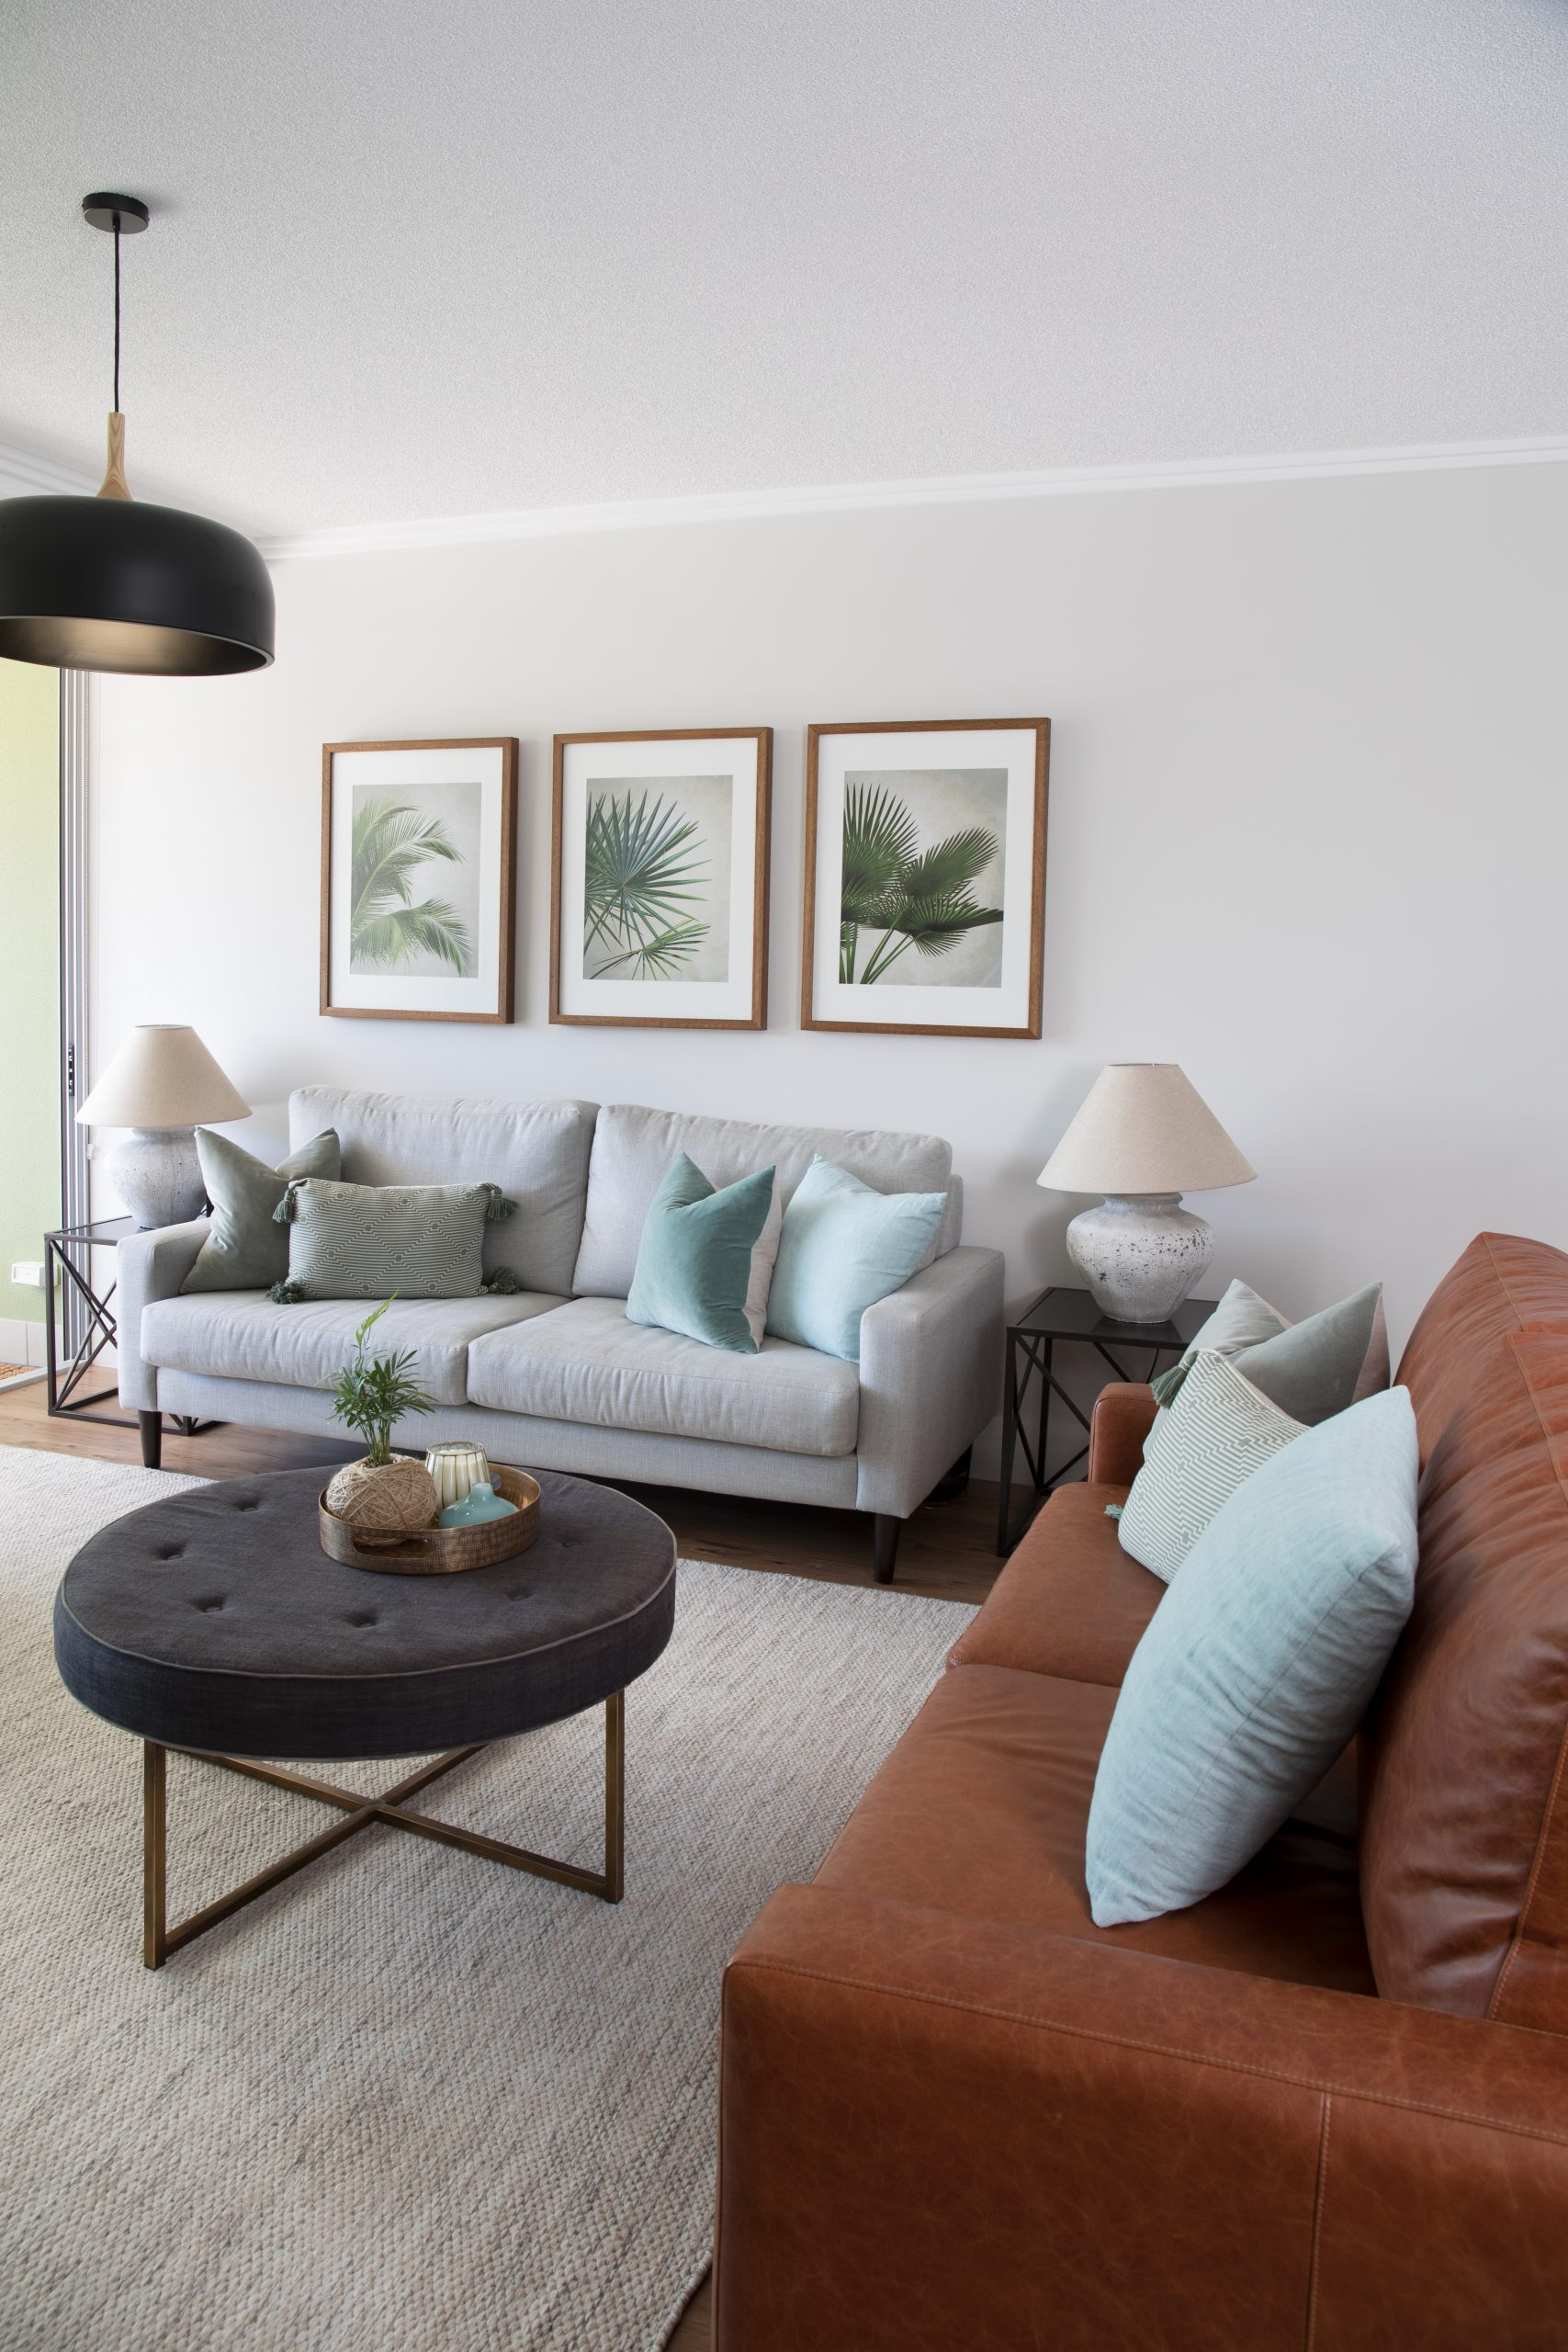 https://www.ivyandfinch.com.au/wp-content/uploads/2021/02/Roma-Street-Parklands-Interior-Design-Lounge-Room-1-scaled.jpg